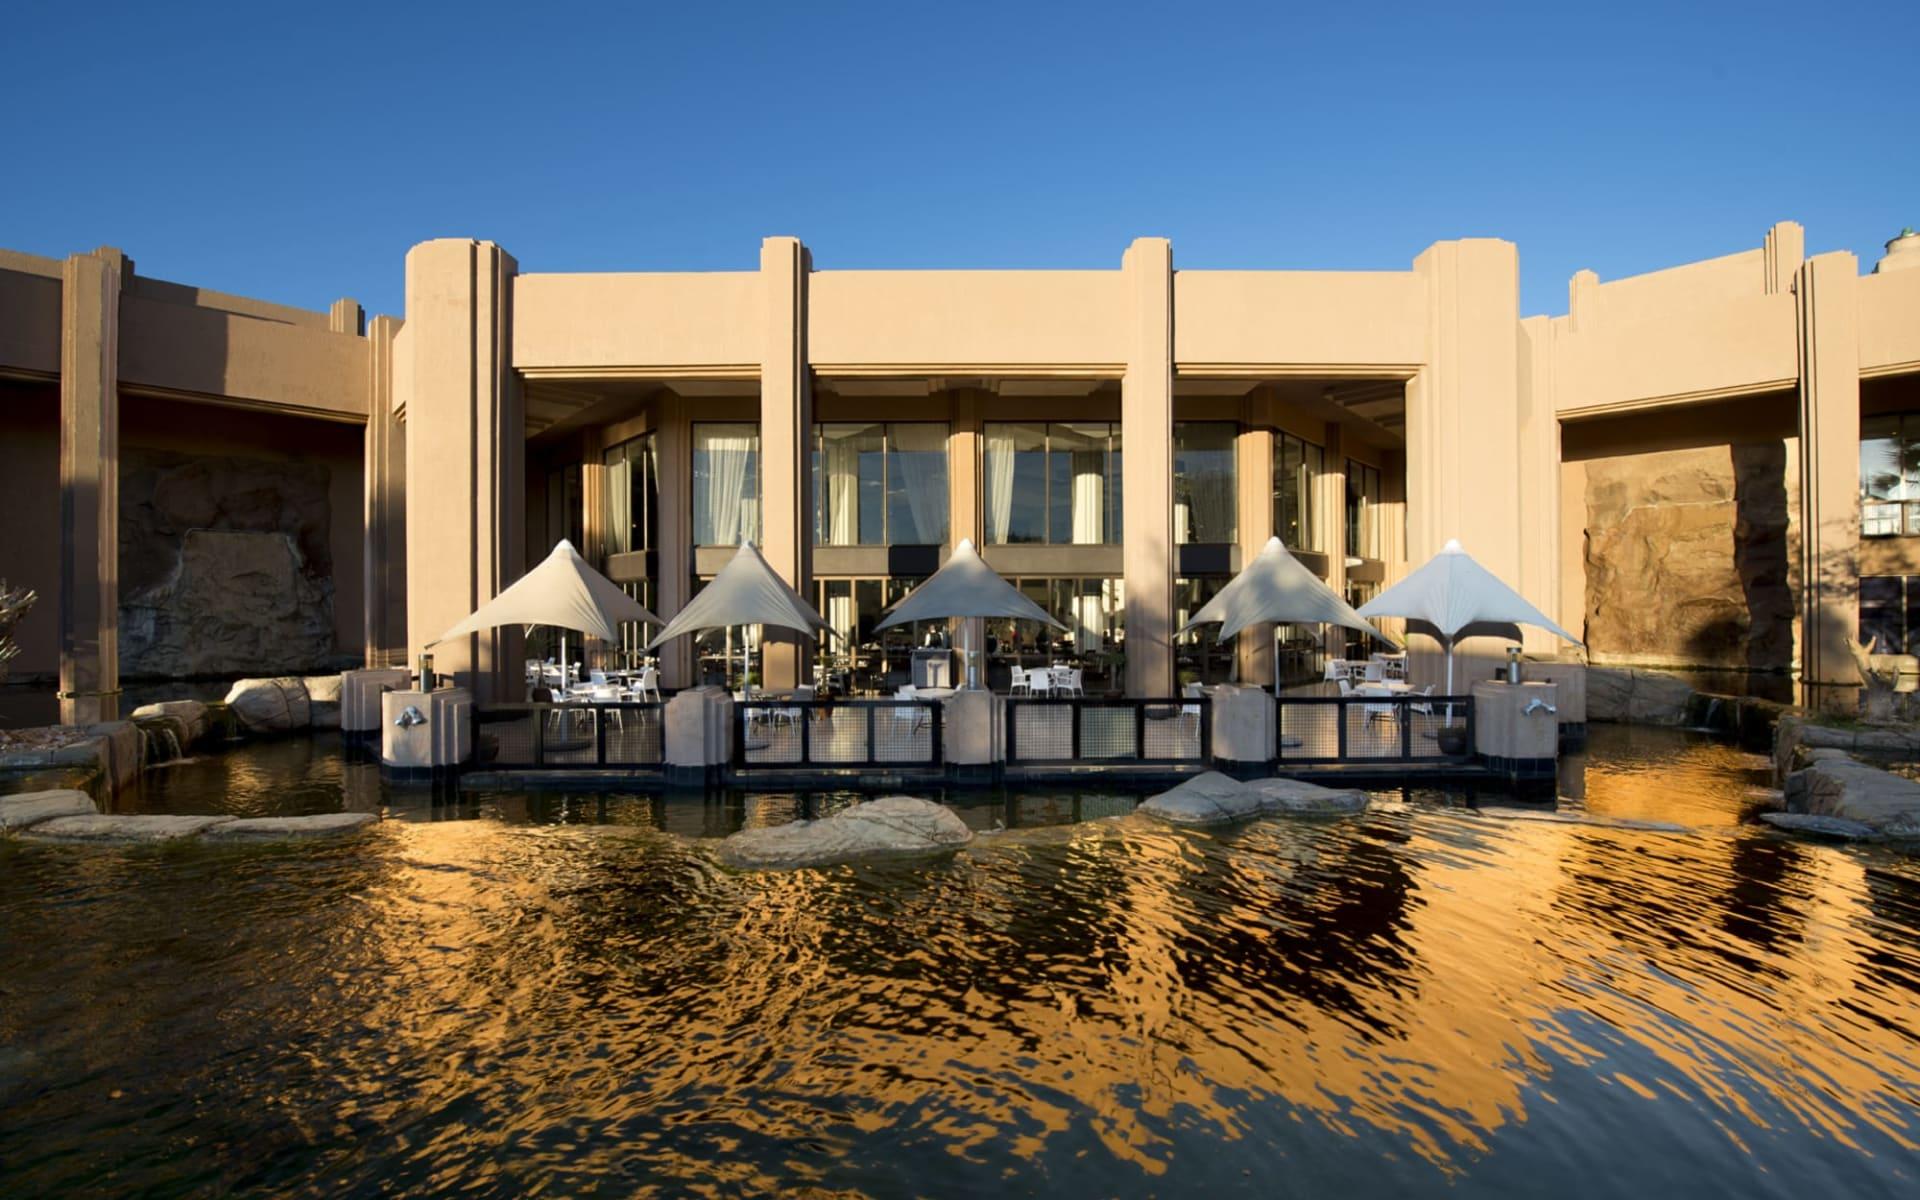 Windhoek Country Club Resort in Eros:  WDH Country Club